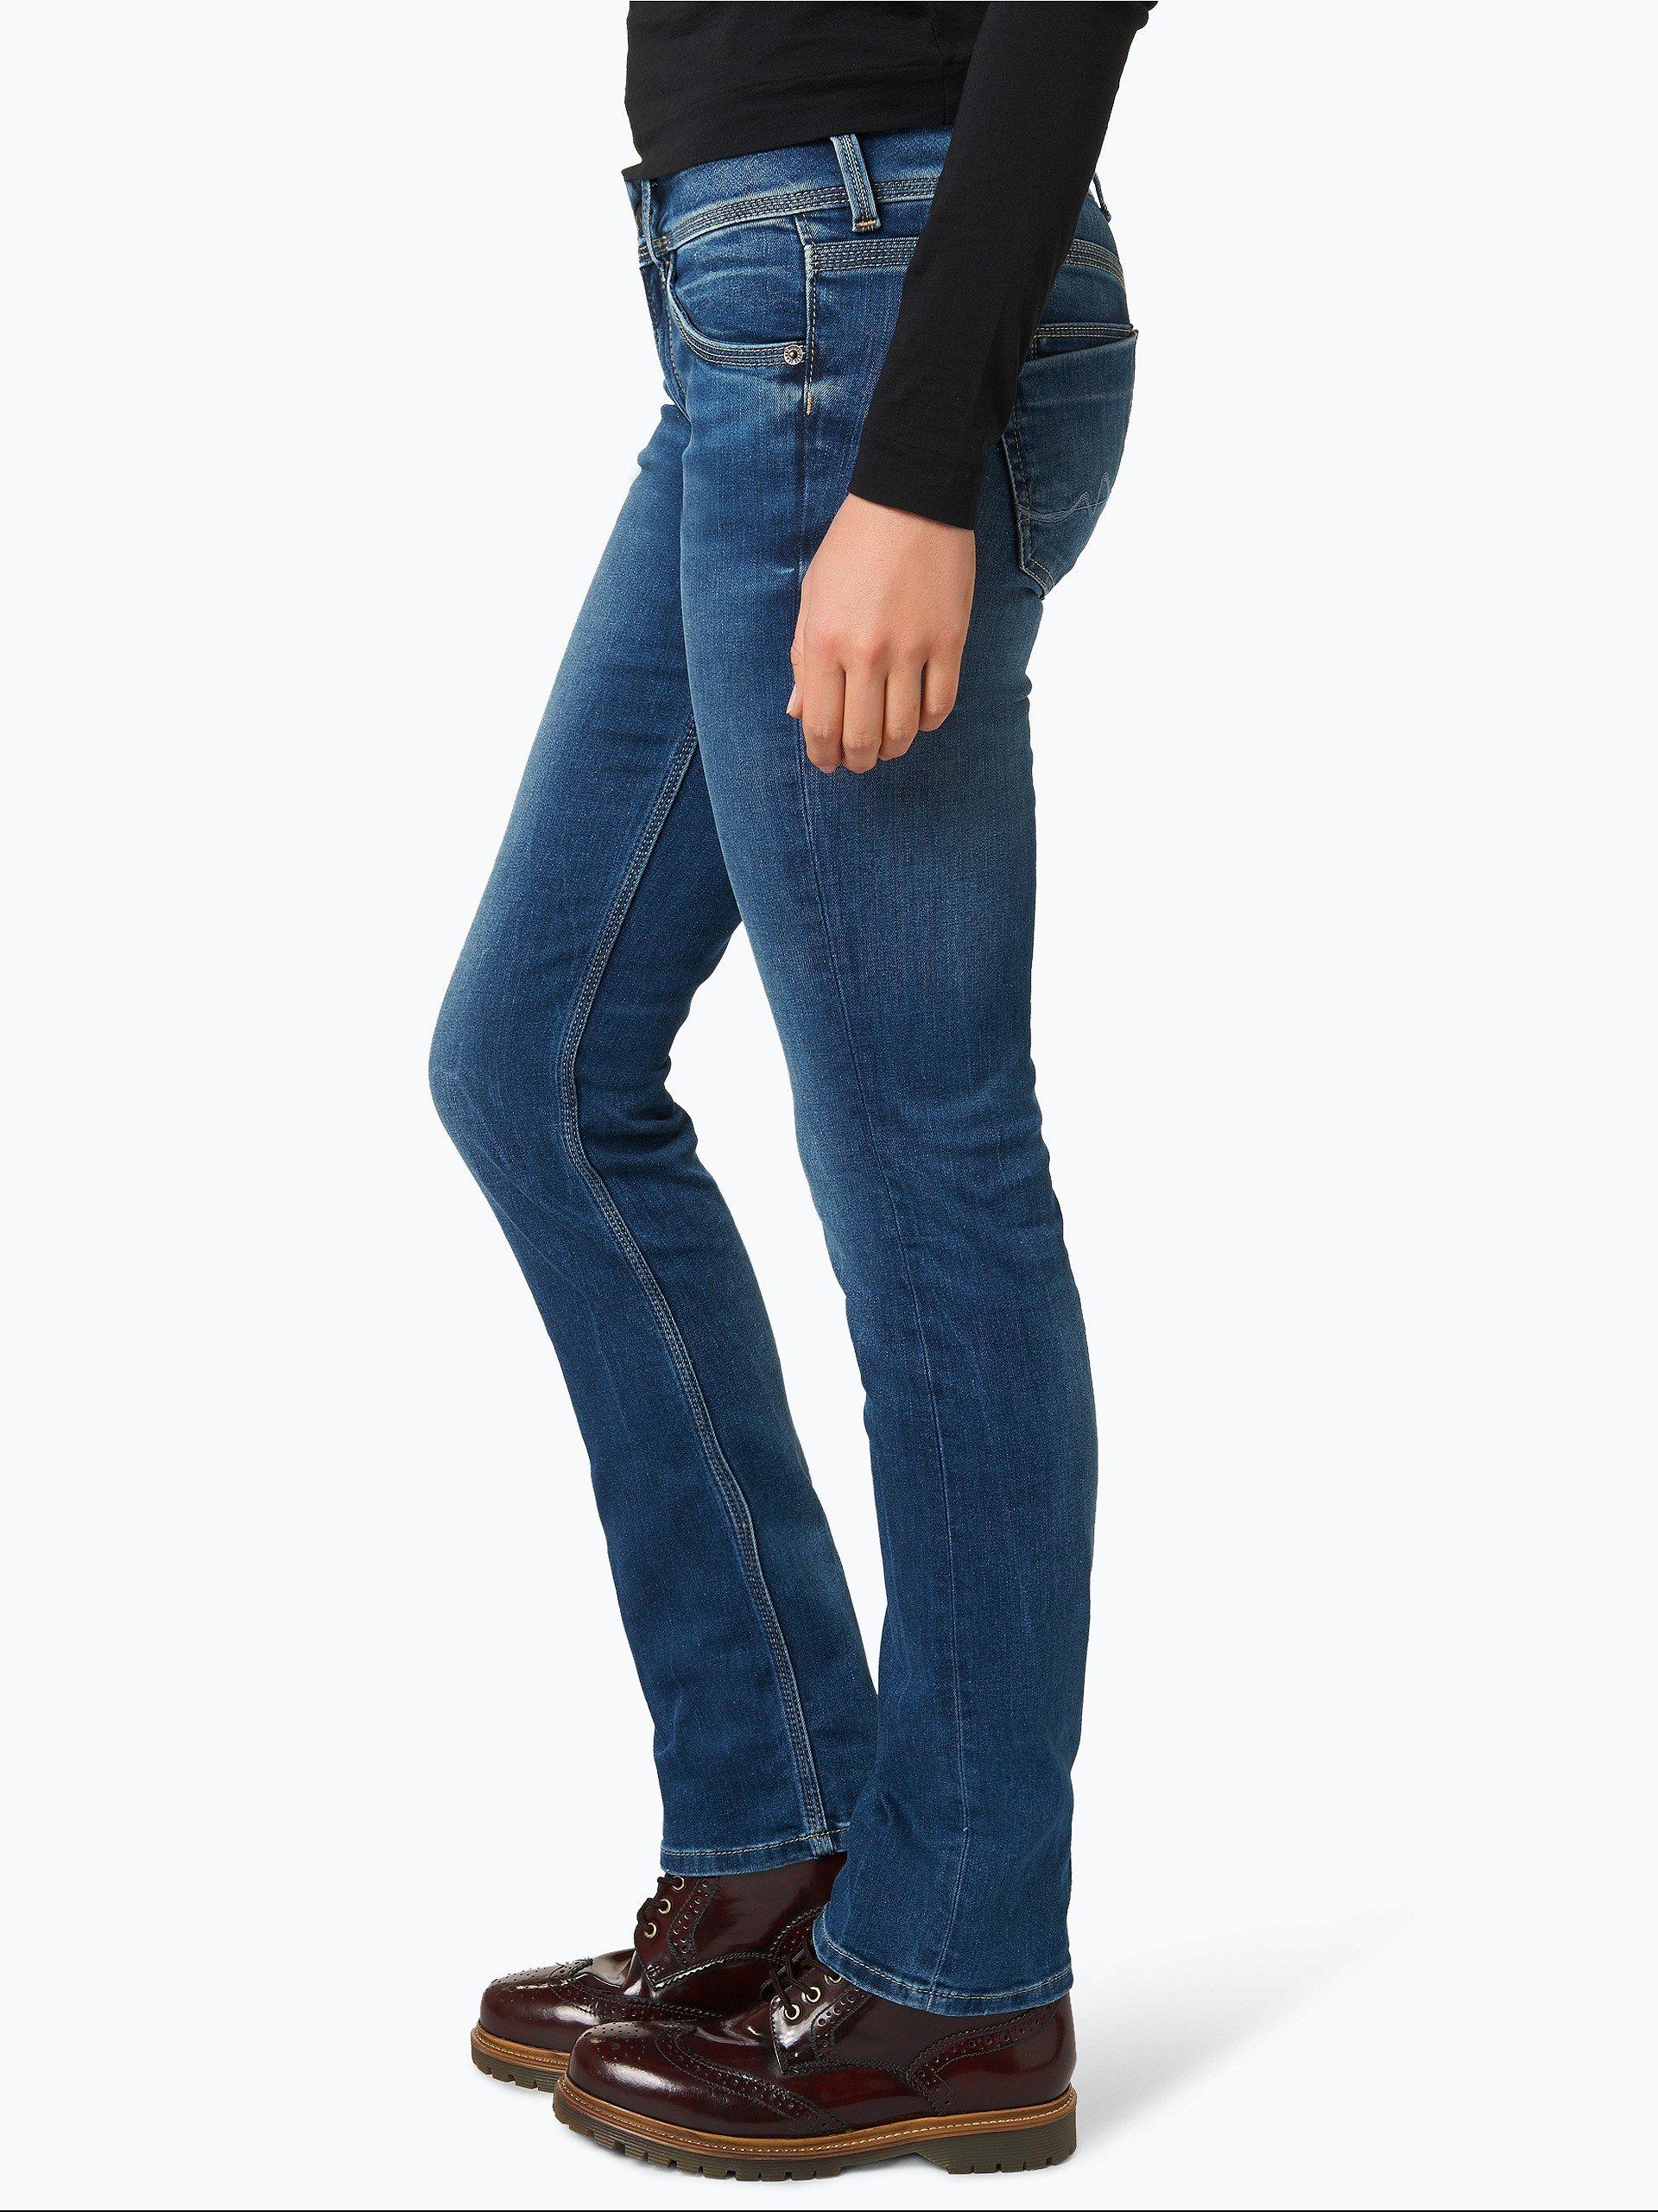 pepe jeans damen jeans saturn blau uni online kaufen peek und cloppenburg de. Black Bedroom Furniture Sets. Home Design Ideas